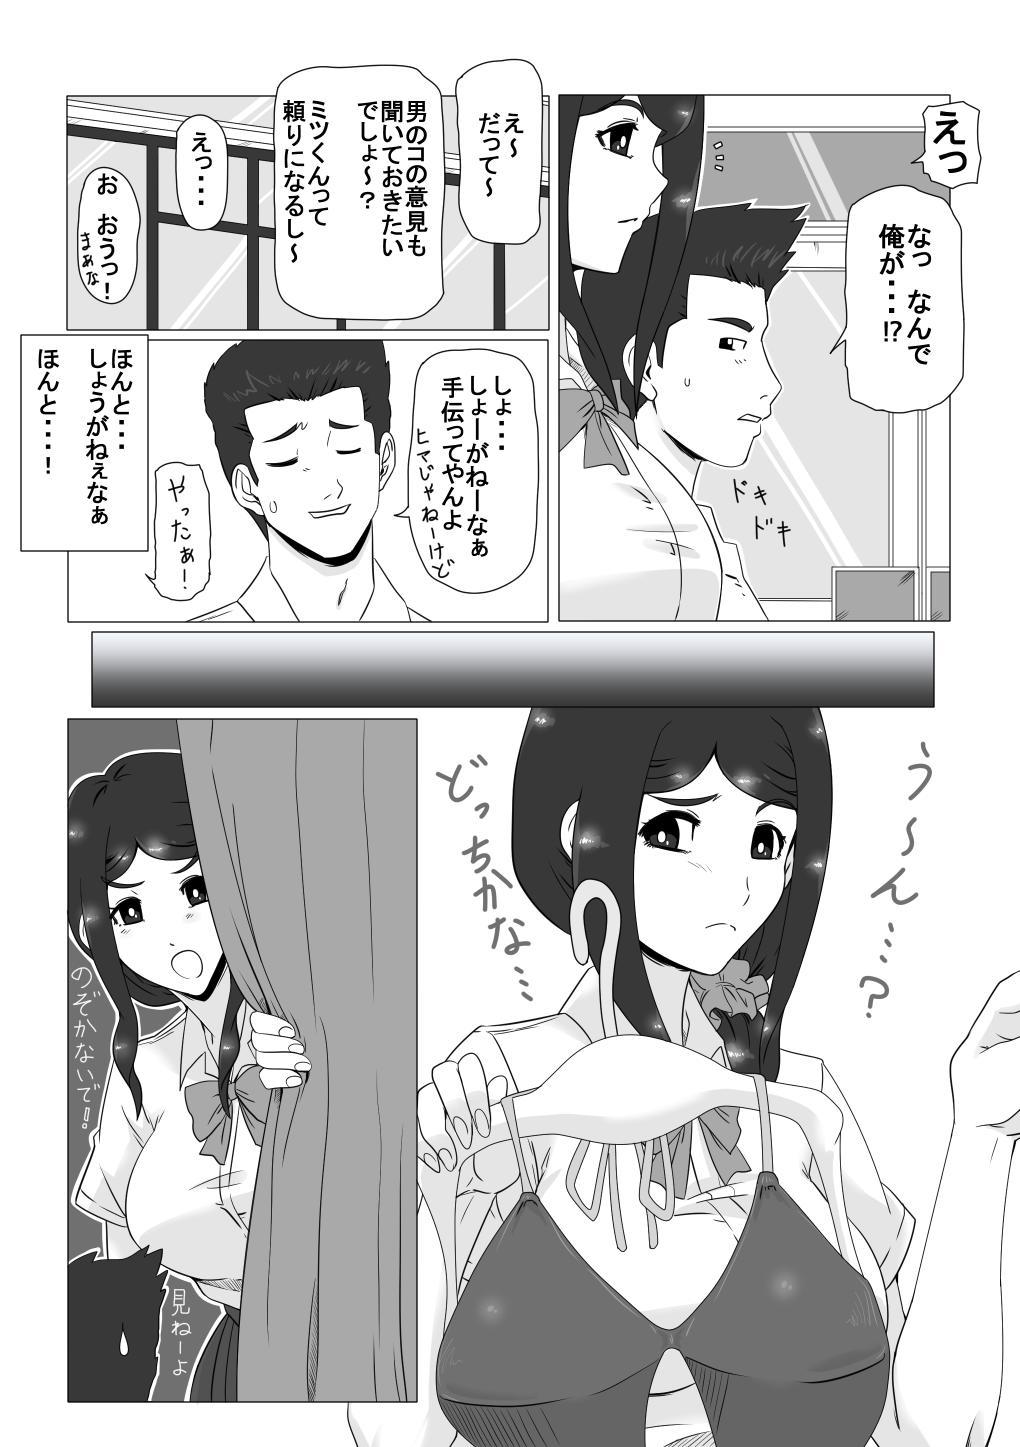 Osananajimi no Natsuyasumi 3